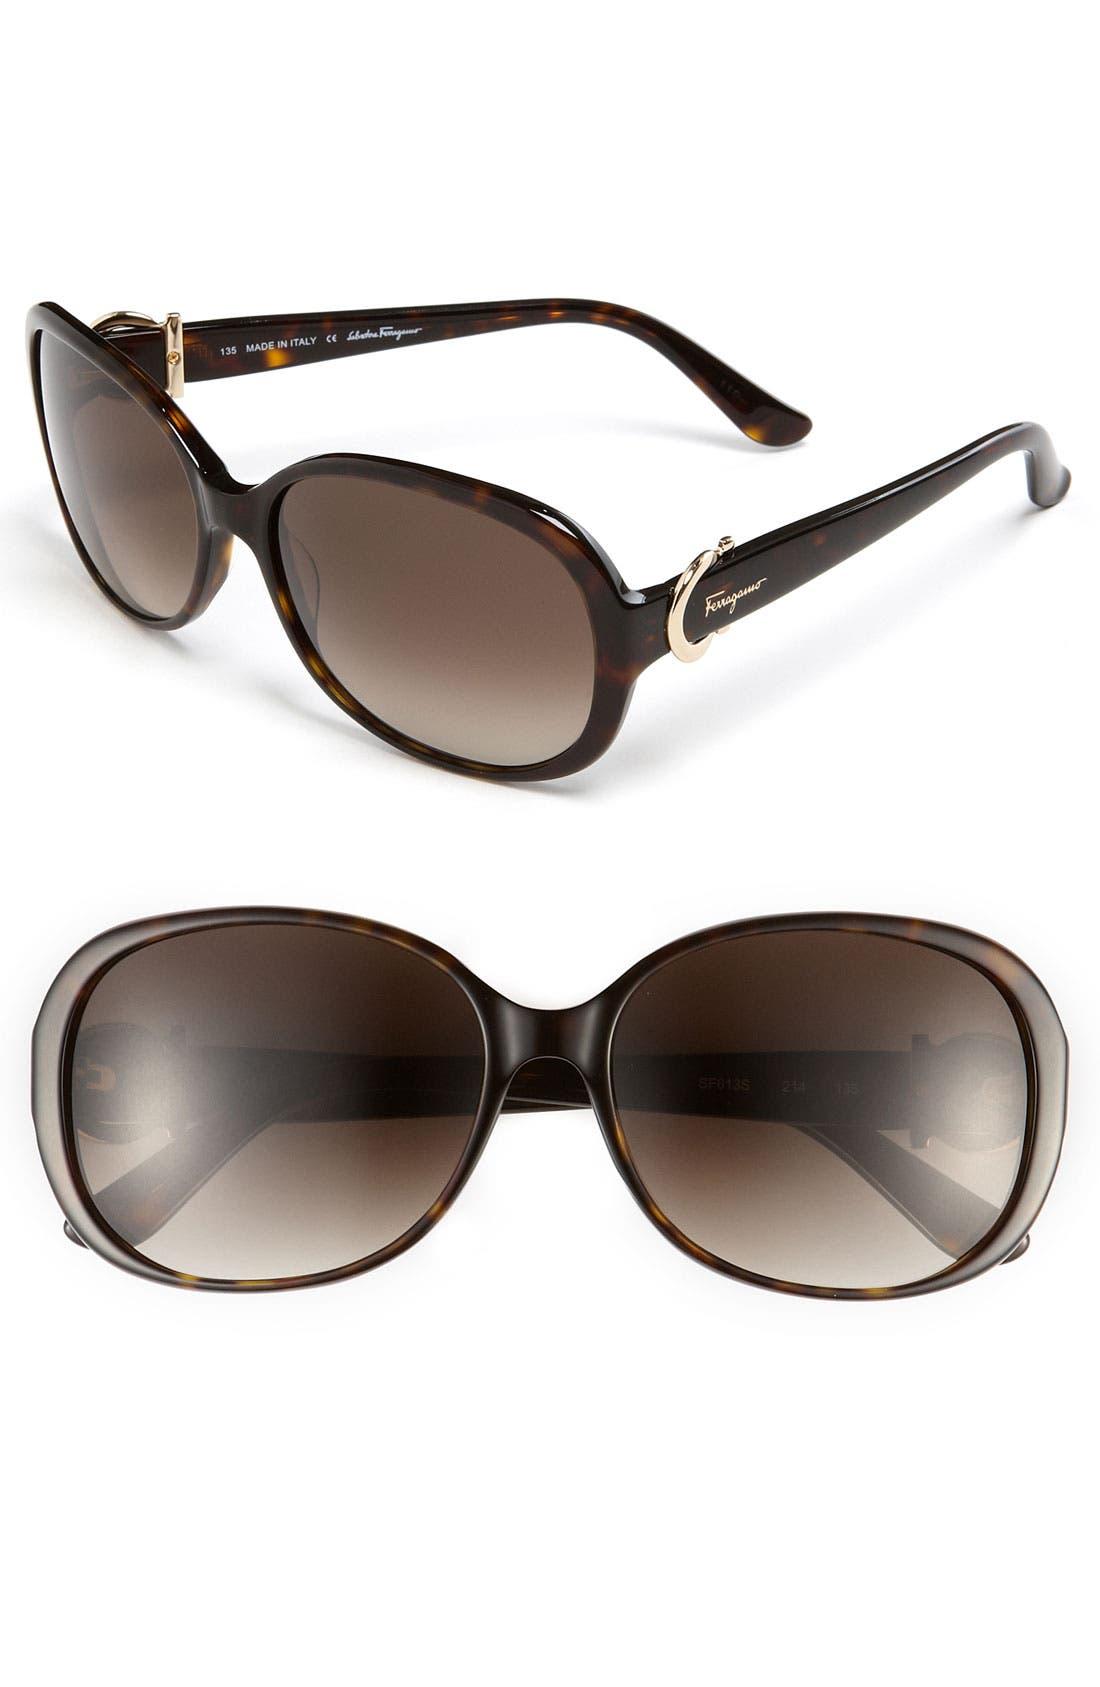 Main Image - Salvatore Ferragamo Classic Sunglasses